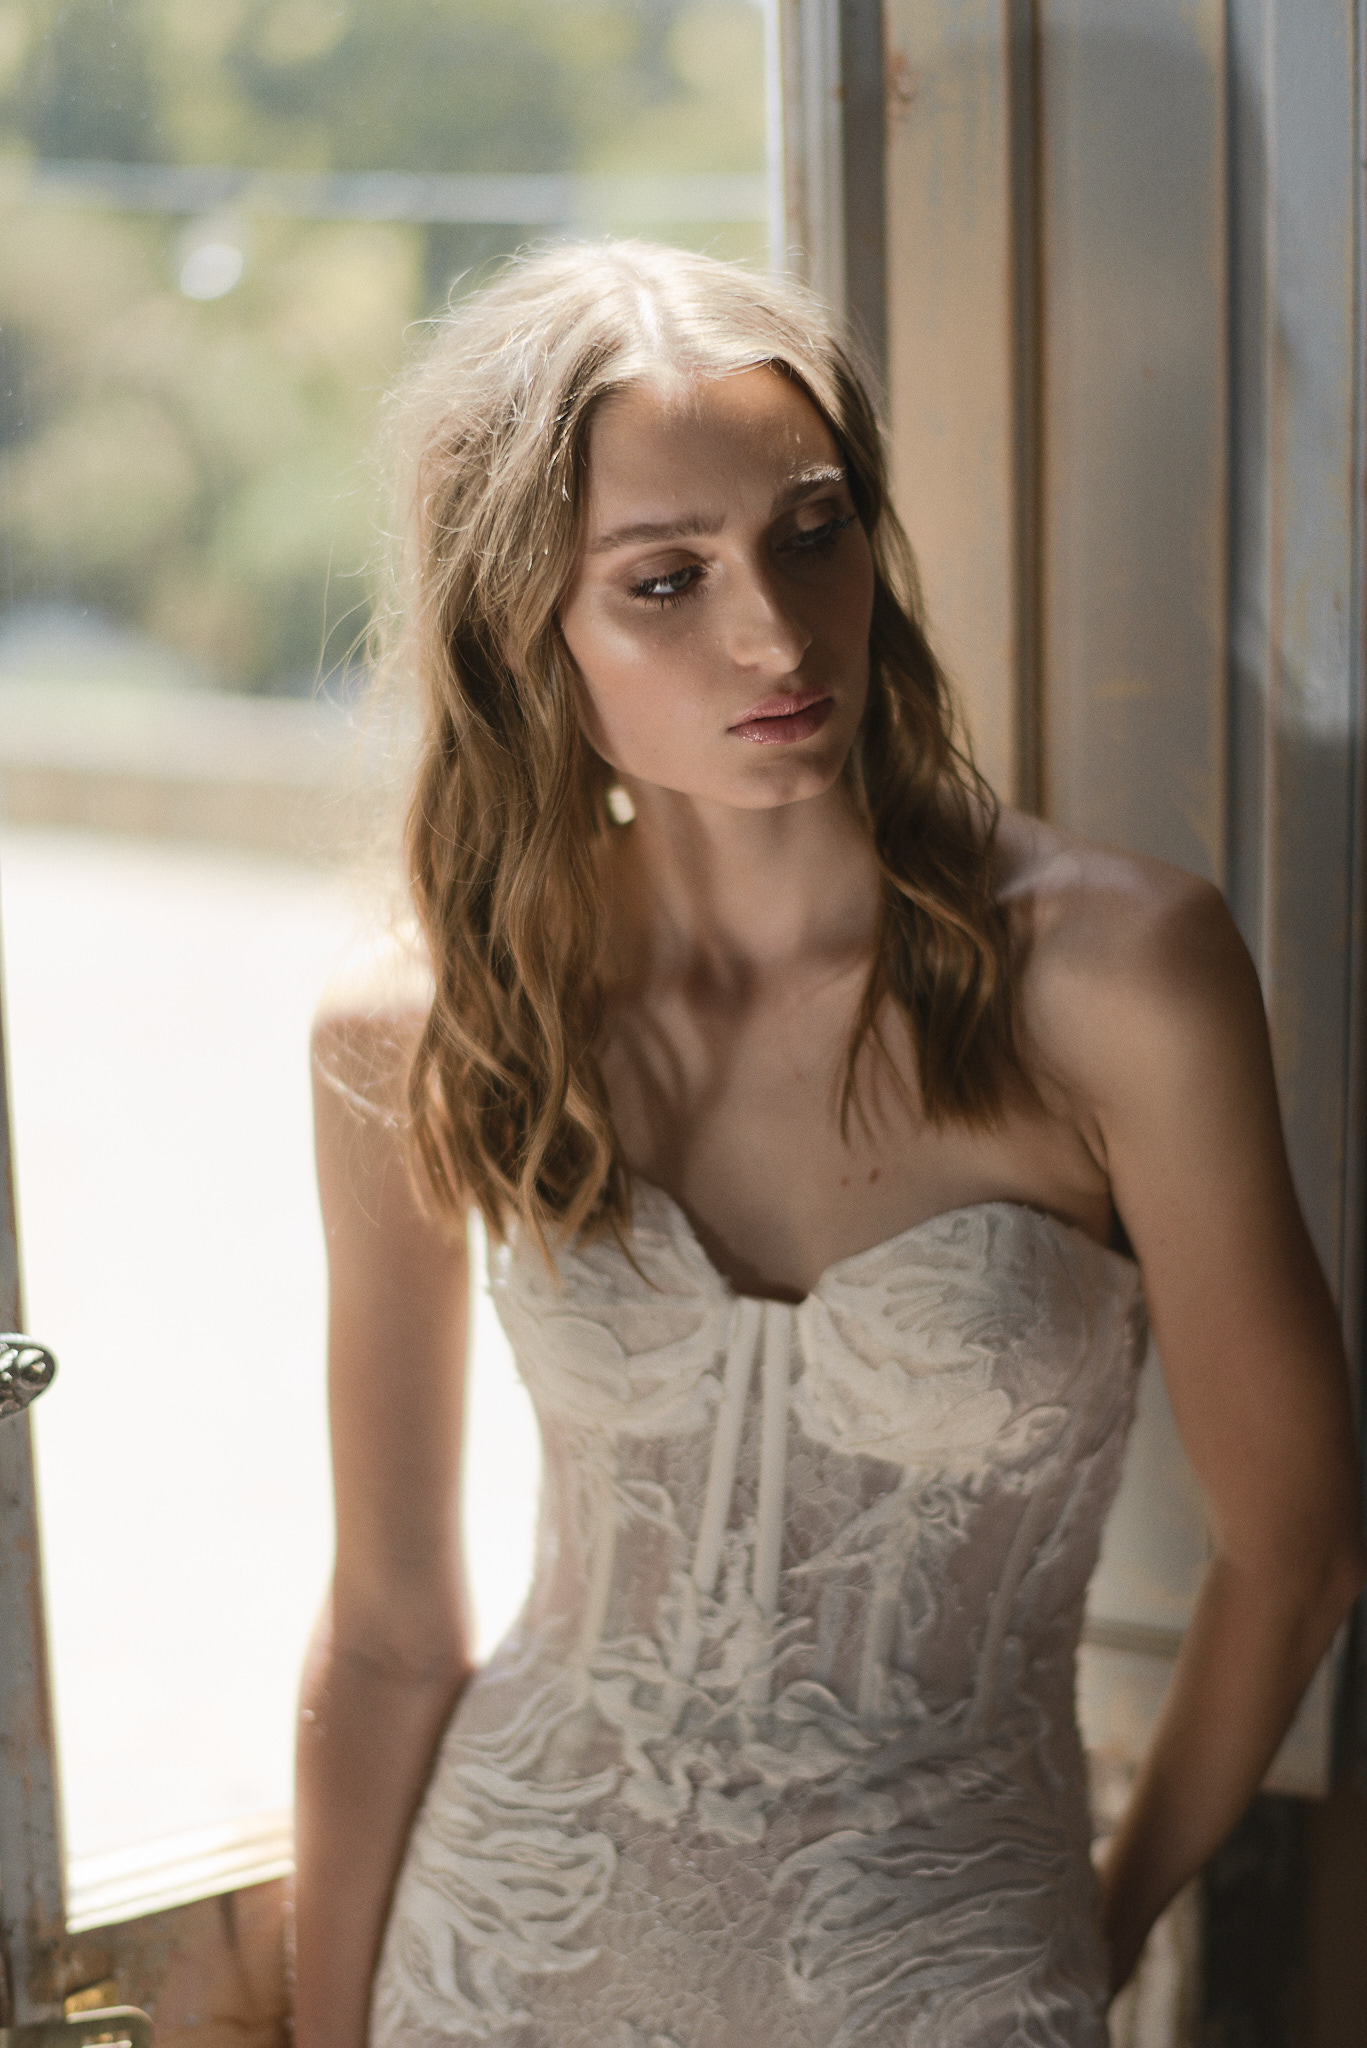 Sephory Photography - Romance is not dead 098 - Web.jpg